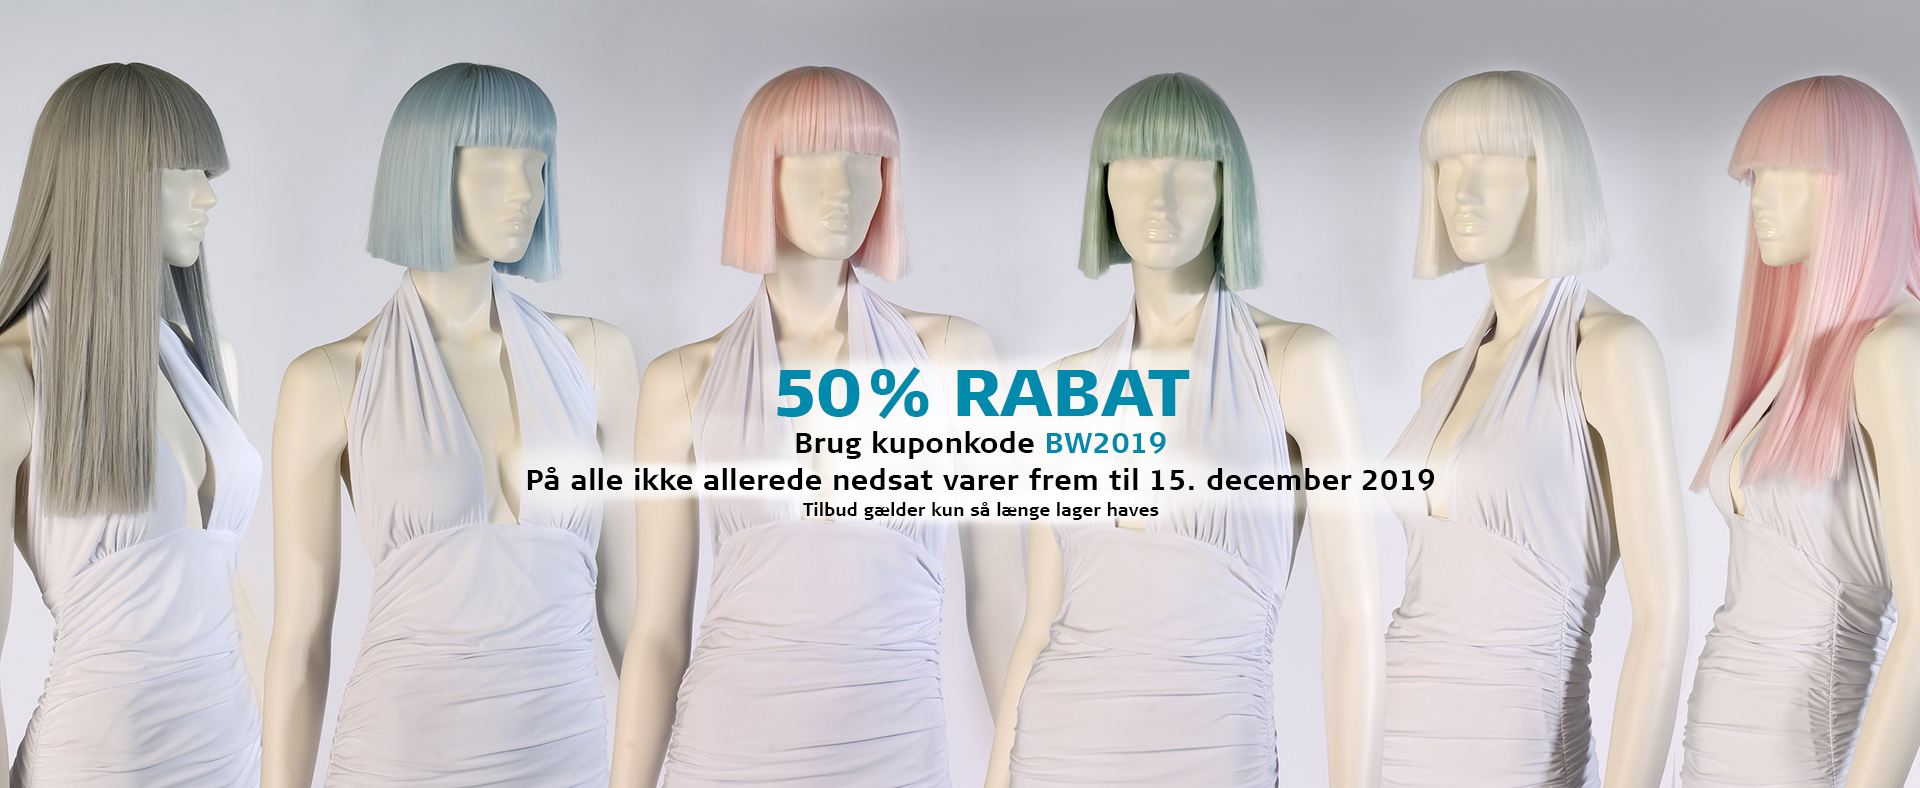 DK44-mannrquins-rabat